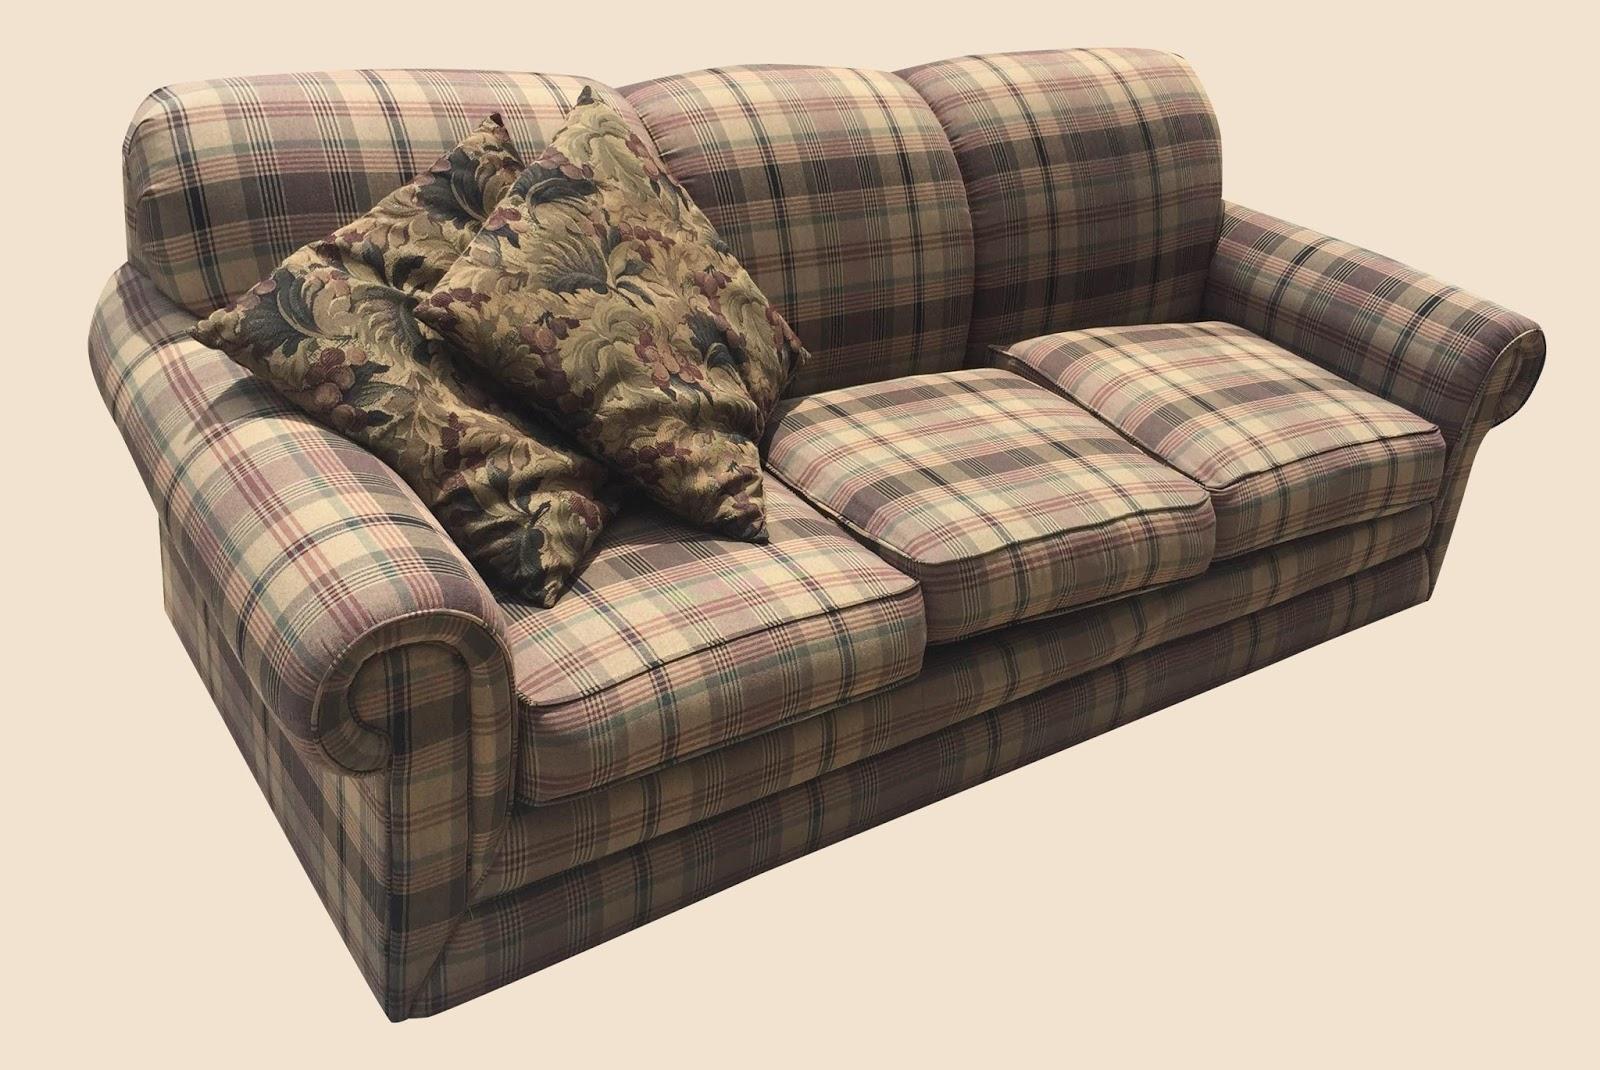 Uhuru Furniture & Collectibles: Brown Plaid Sofa